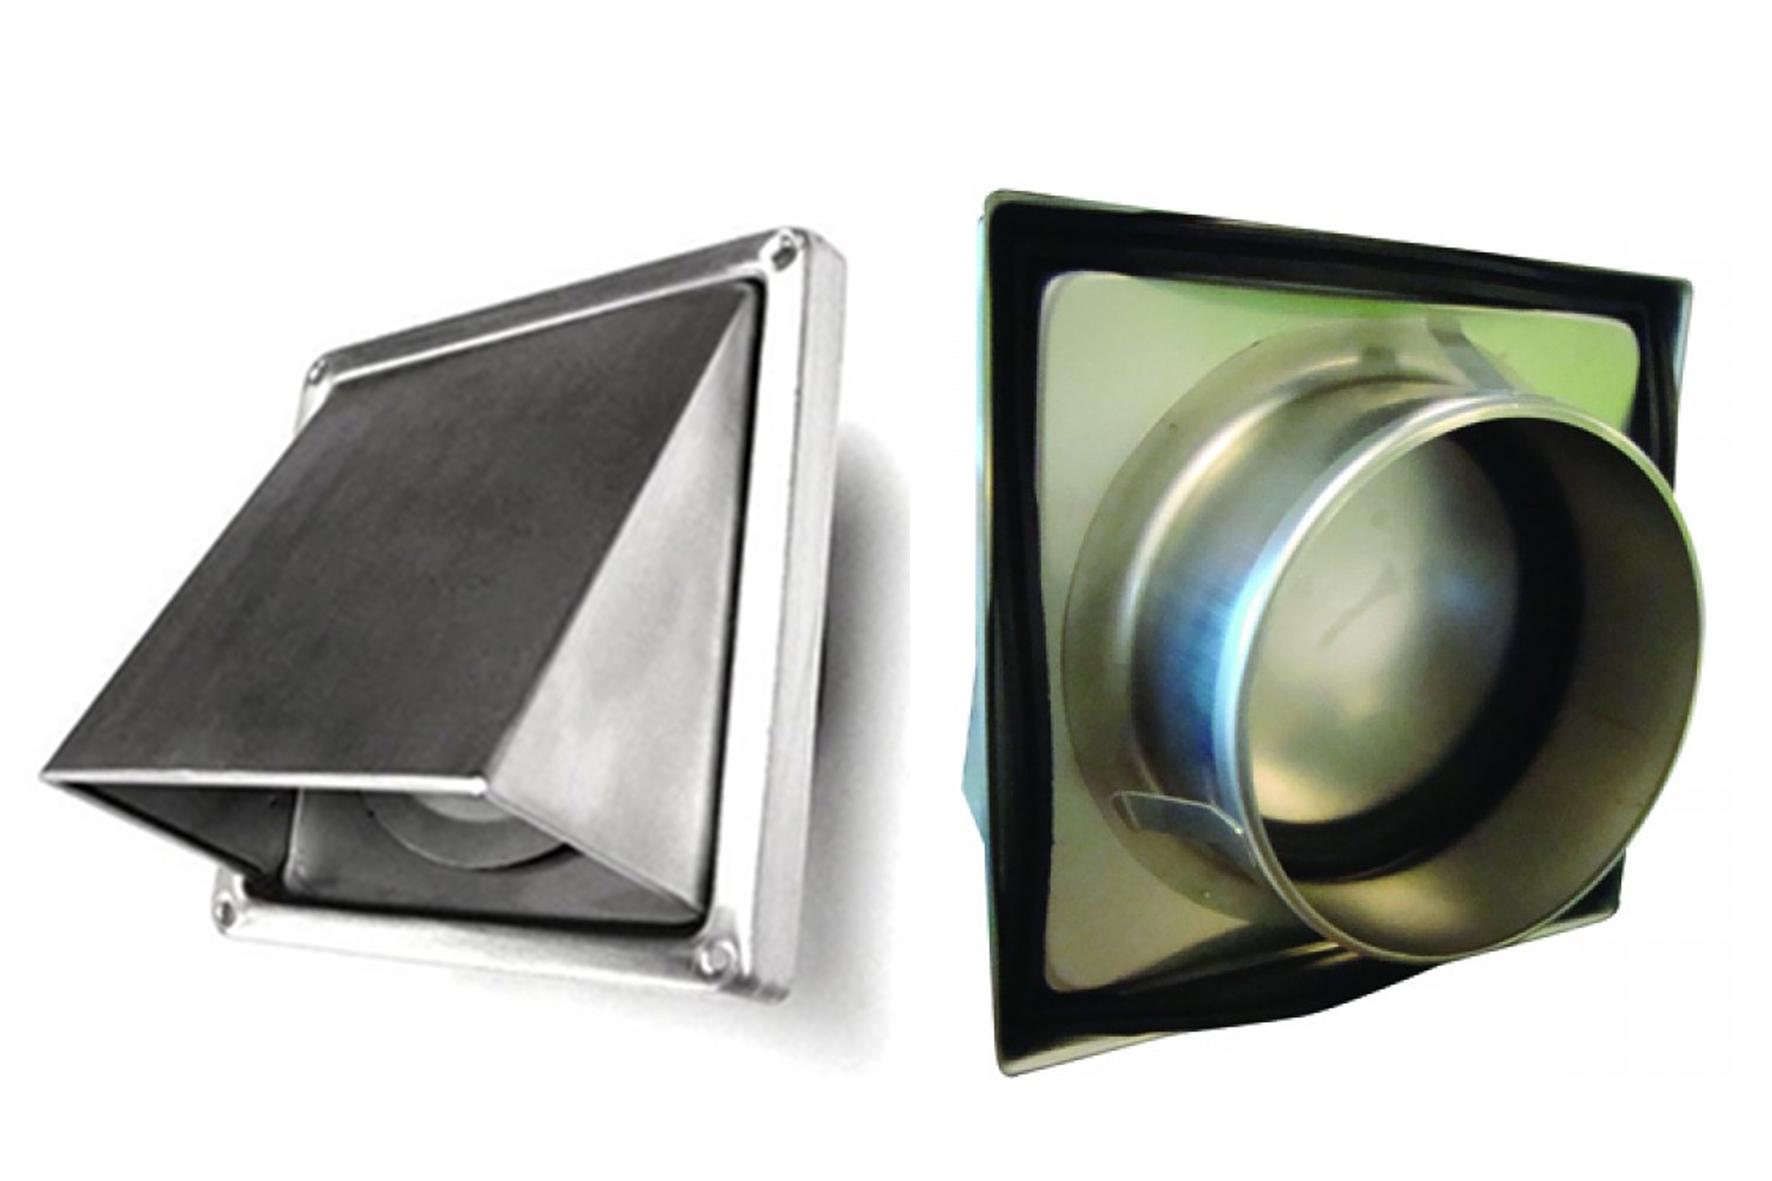 grille de surpression renson 641 achat en ligne ou dans notre magasin. Black Bedroom Furniture Sets. Home Design Ideas